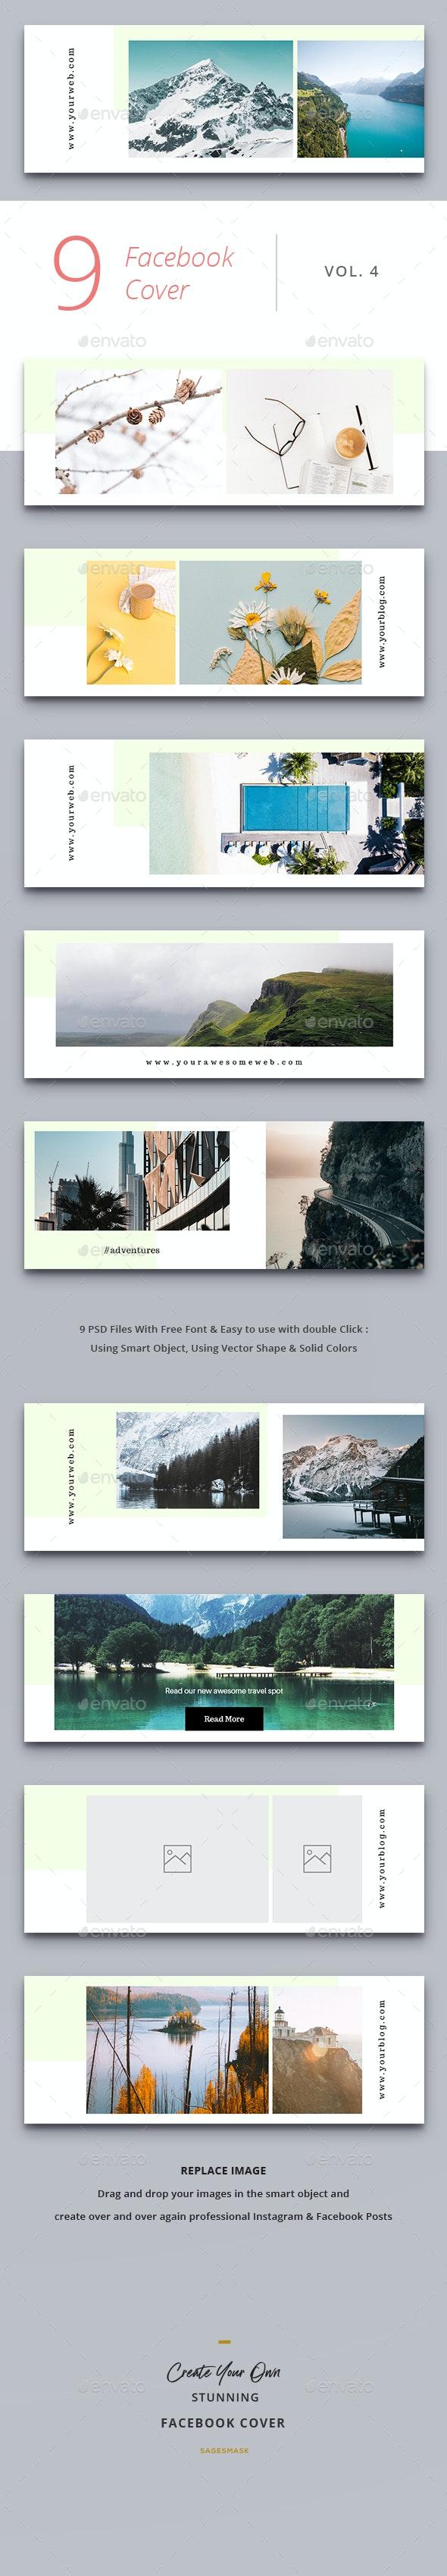 Facebook Cover Vol. 4 - Facebook Timeline Covers Social Media